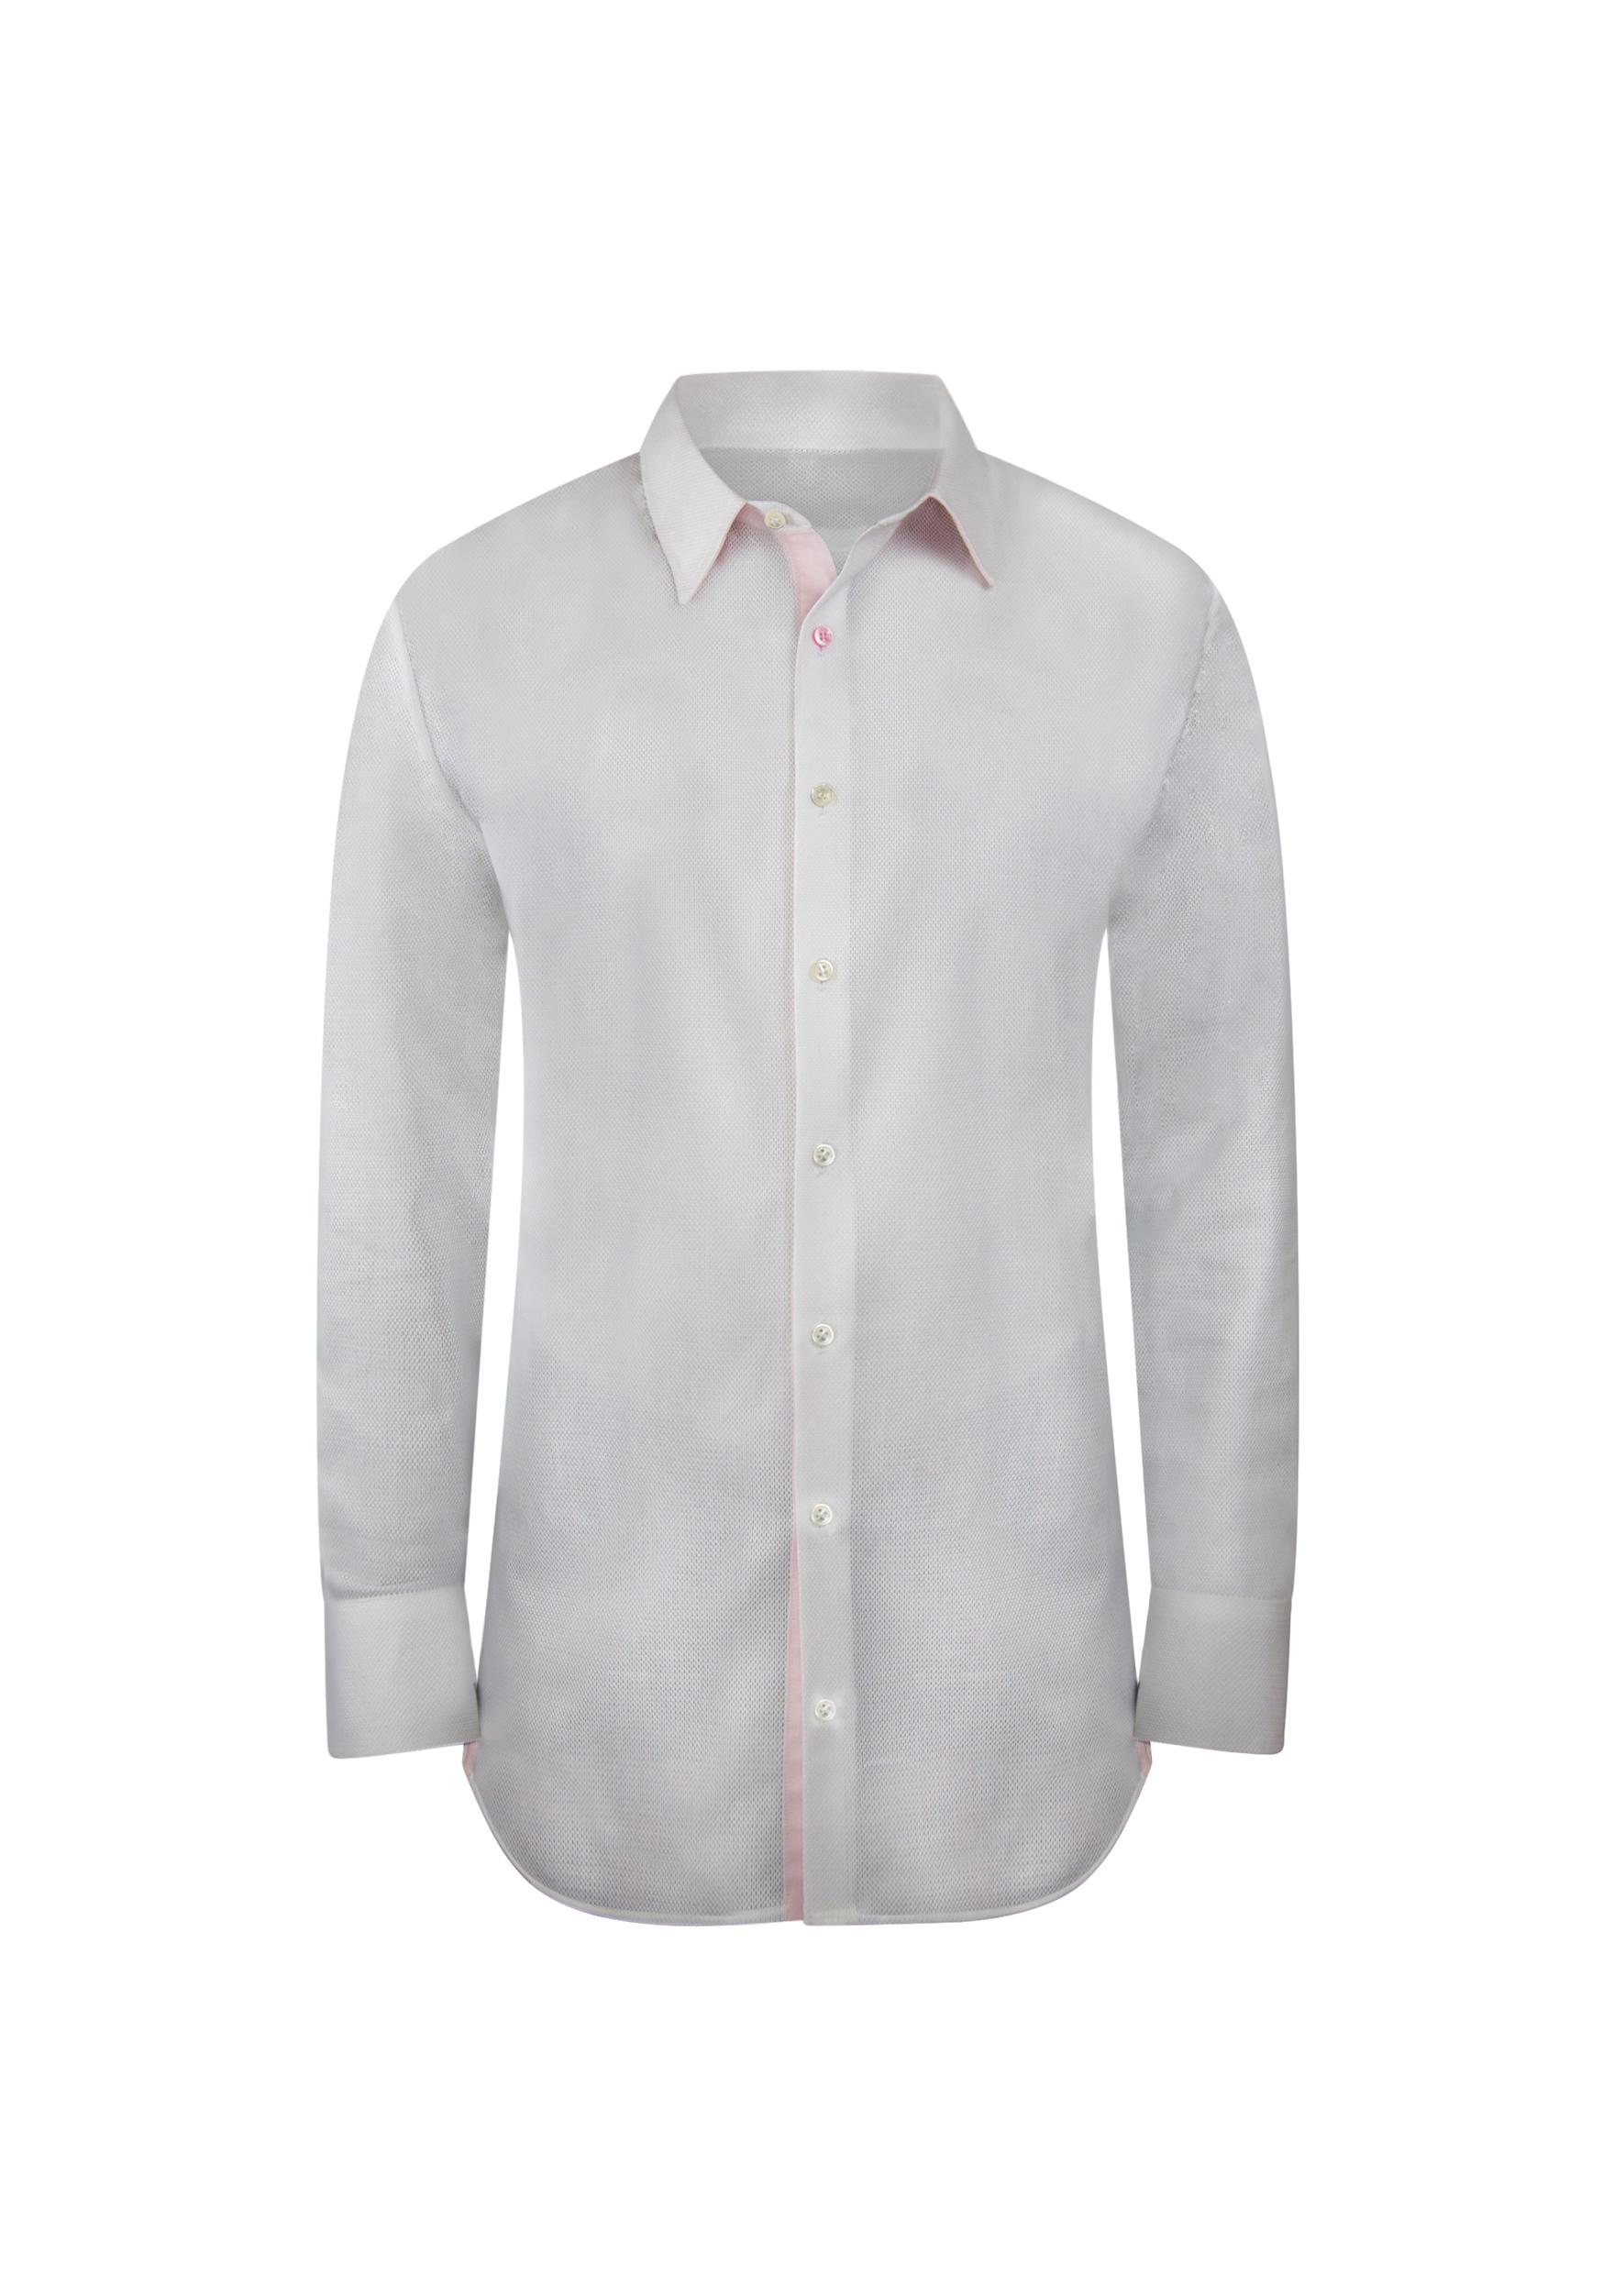 Bespoke shirt